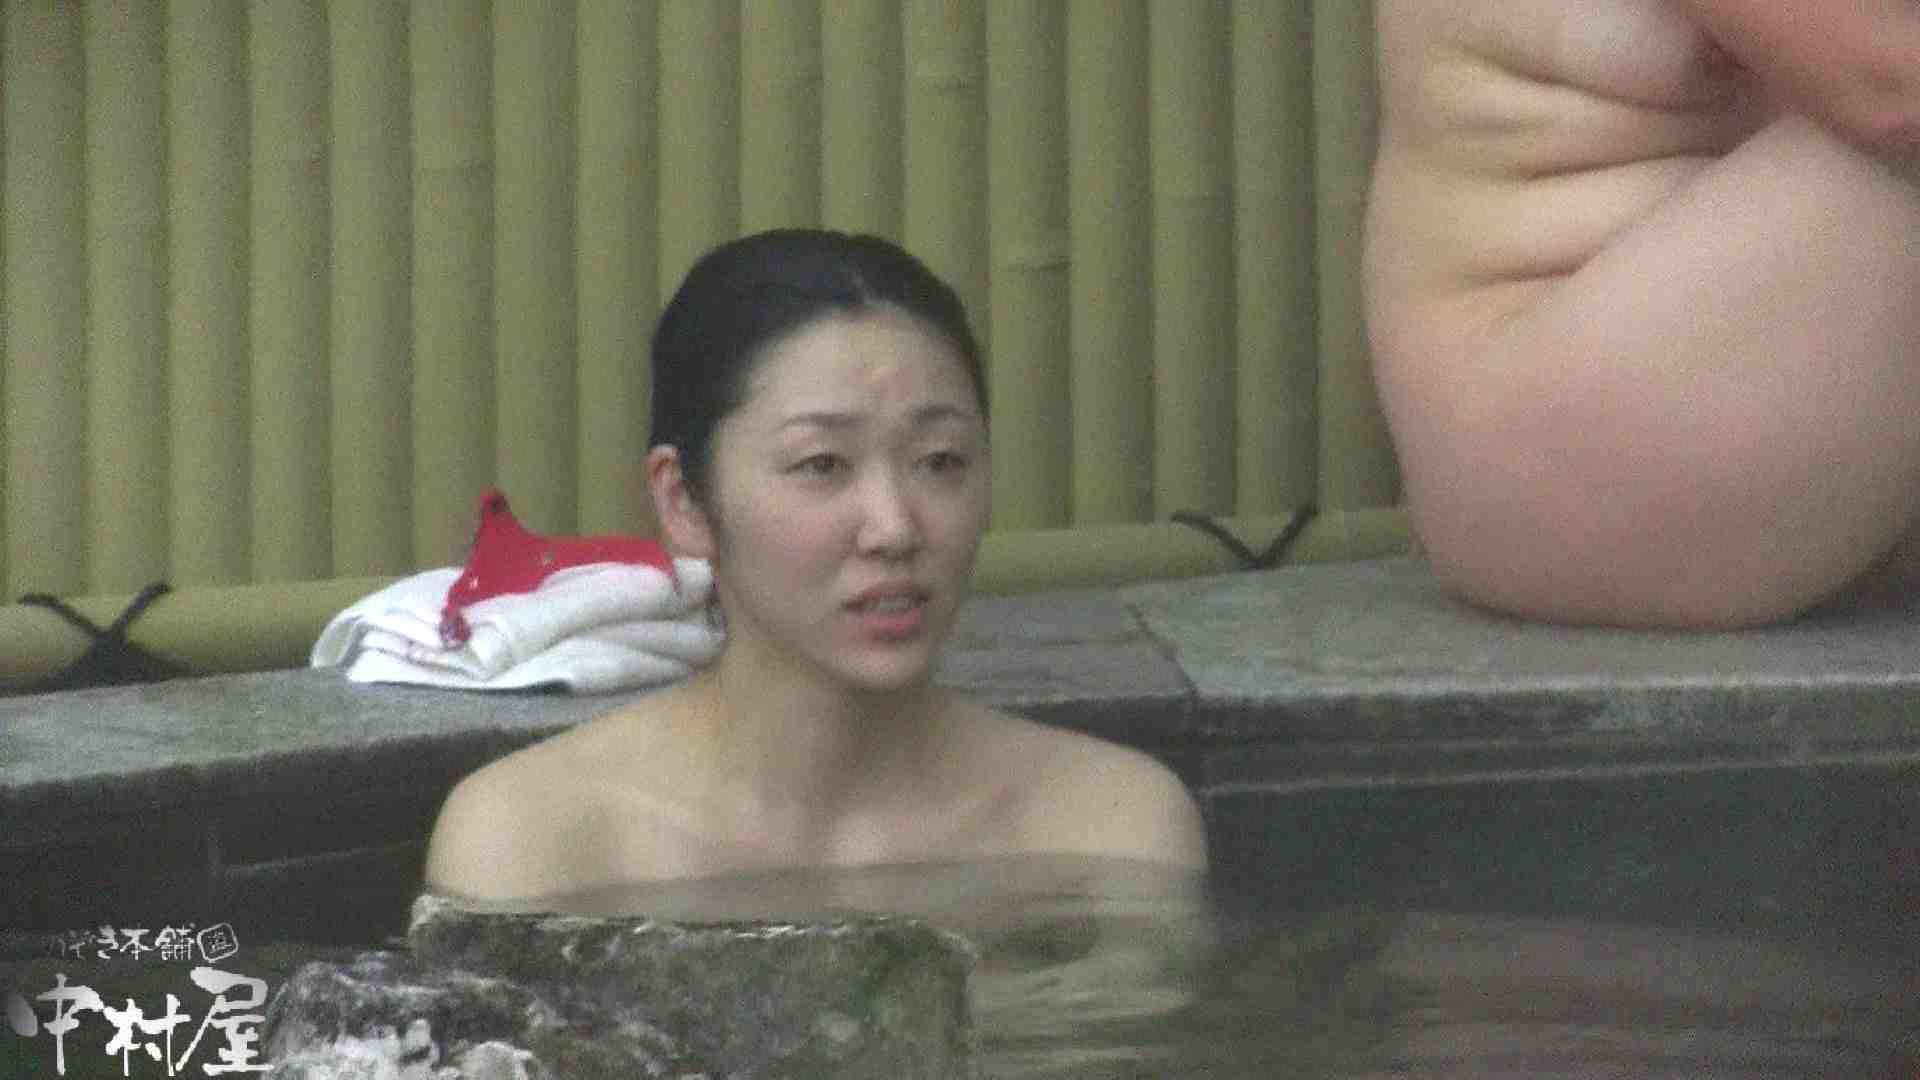 Aquaな露天風呂Vol.917 OLセックス   盗撮  102画像 31